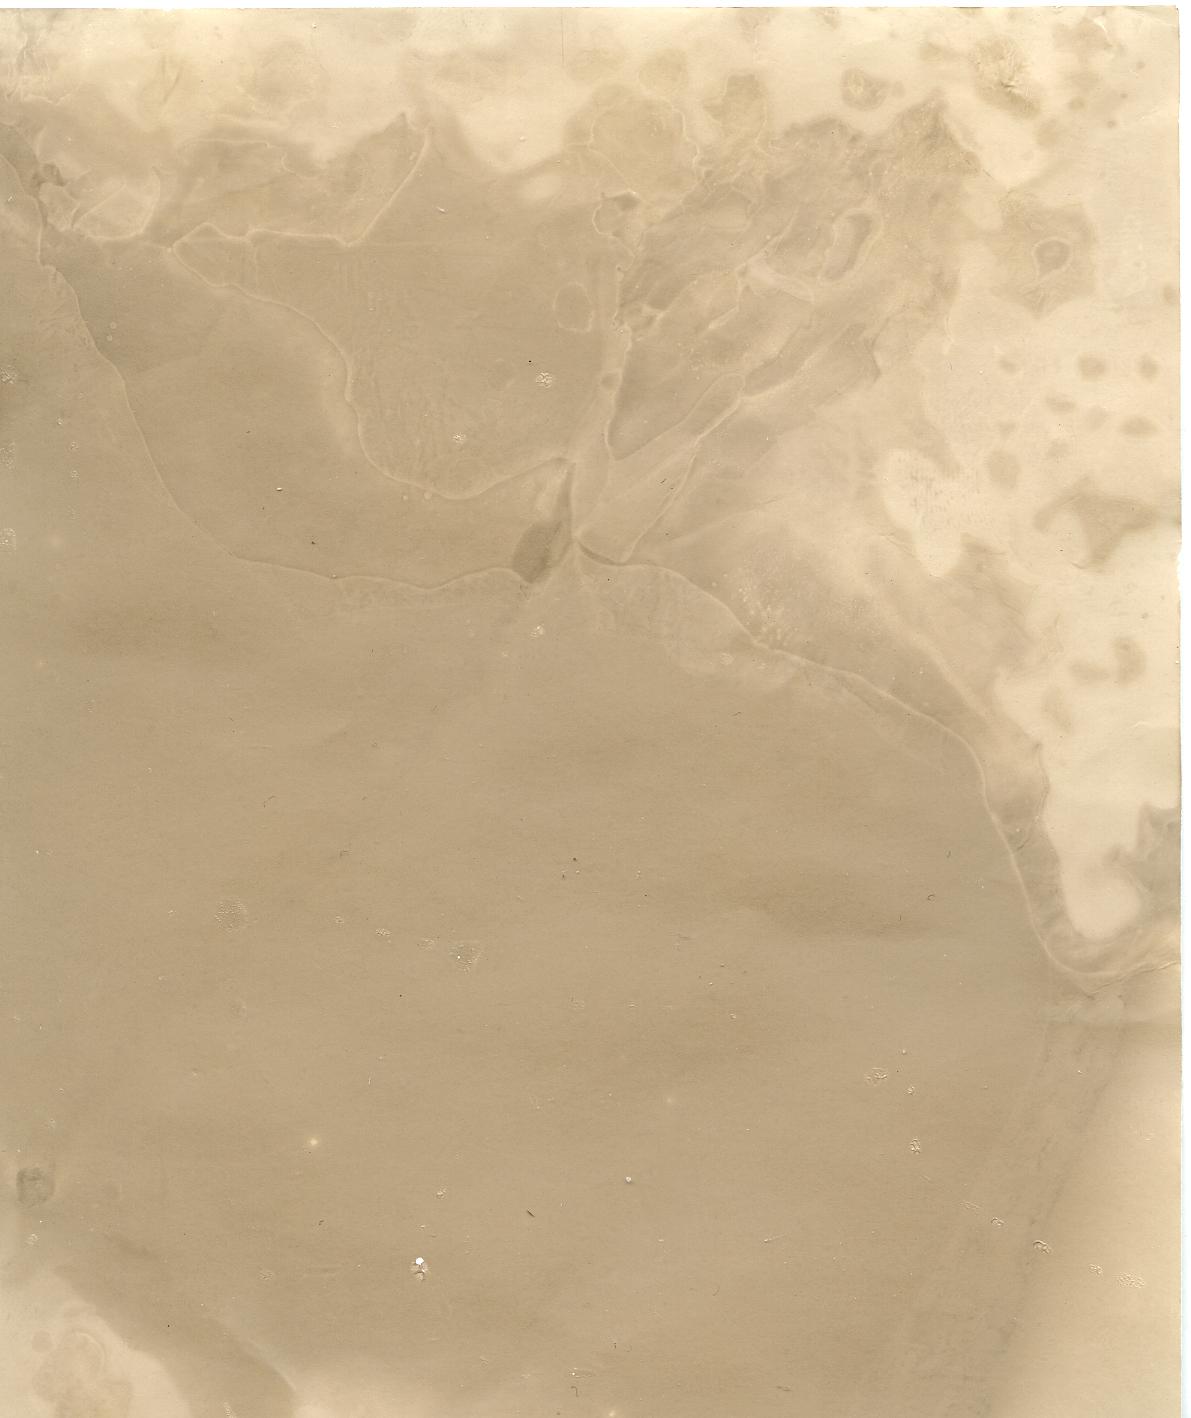 lumen-water-7.jpg